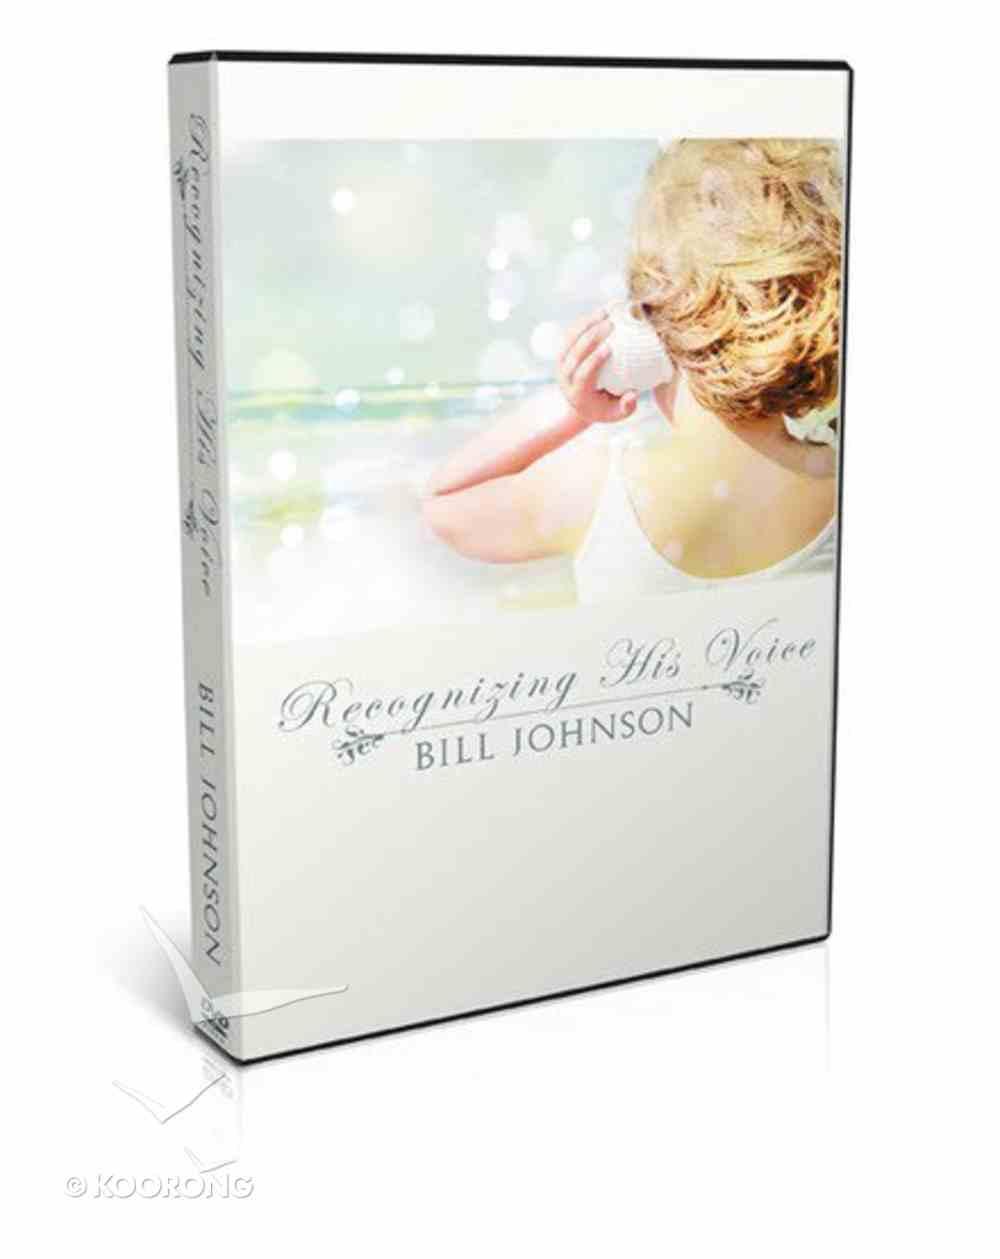 Recognising His Voice DVD